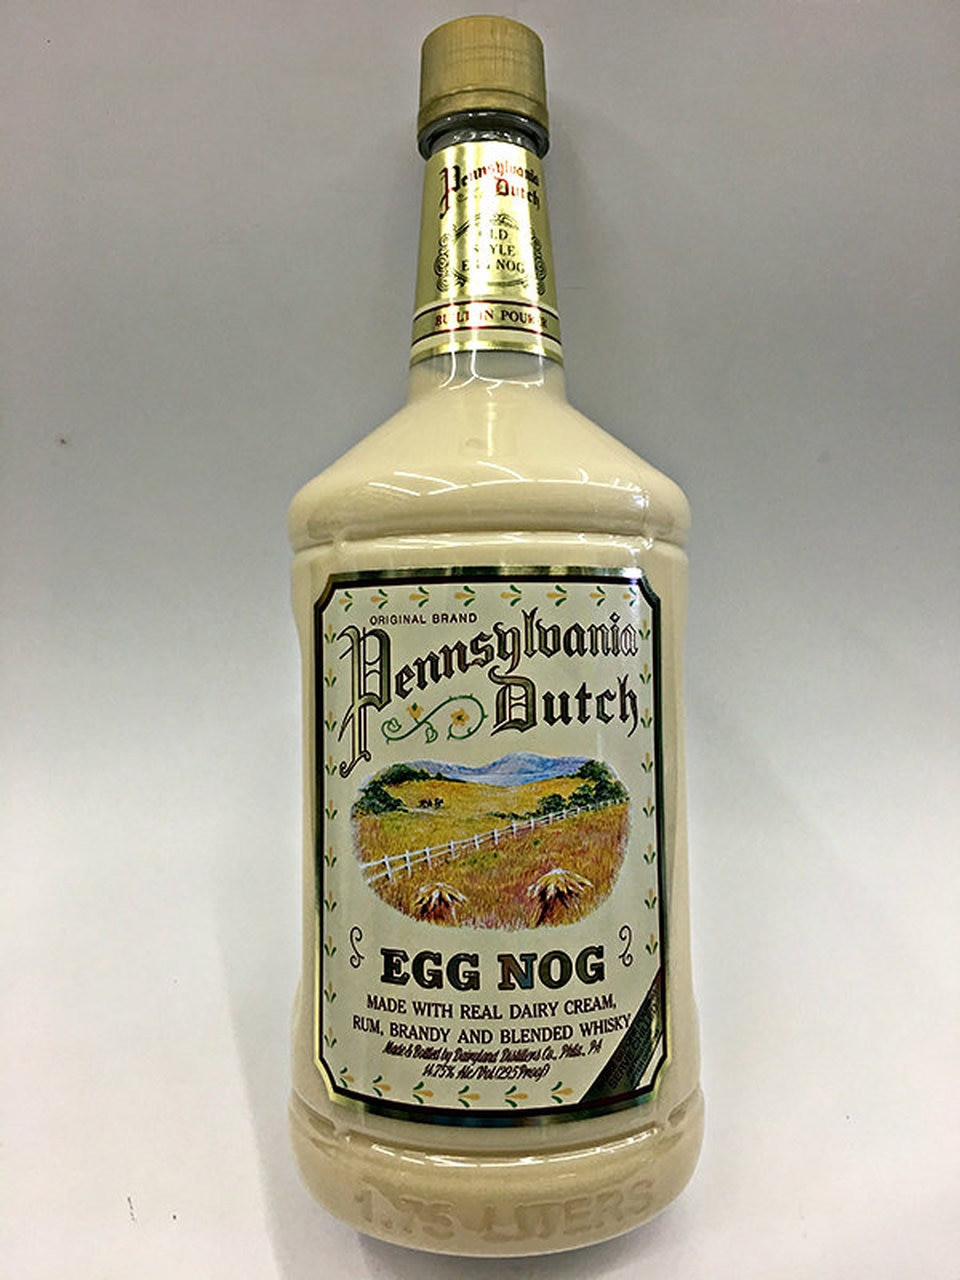 Eggnog Alcoholic Drinks  Pennsylvania Dutch Egg Nog 1 75 Liter